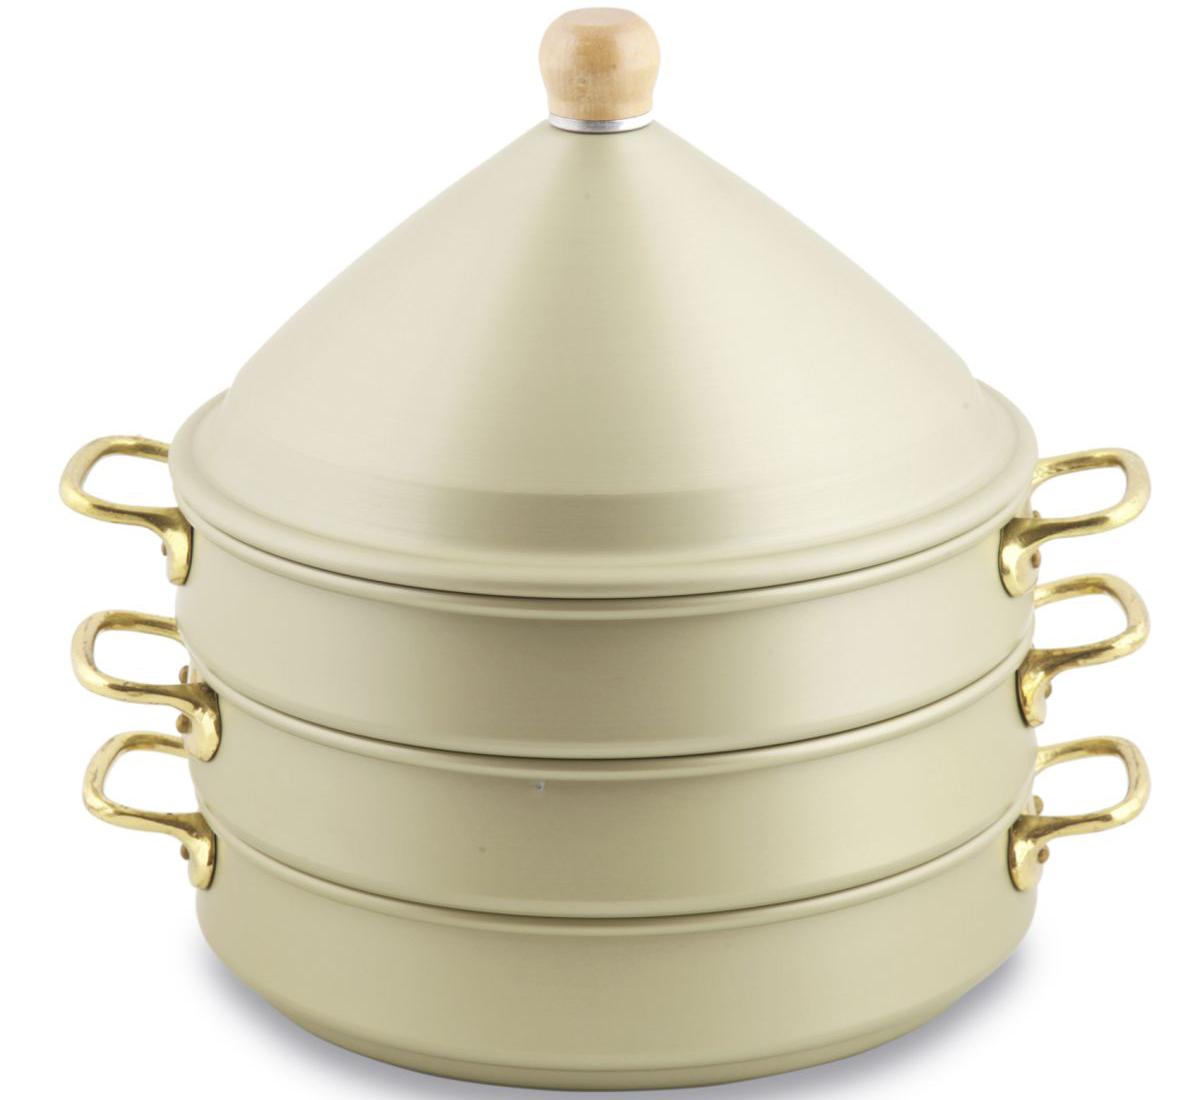 Кастрюля-пароварка Total Kitchen Goods